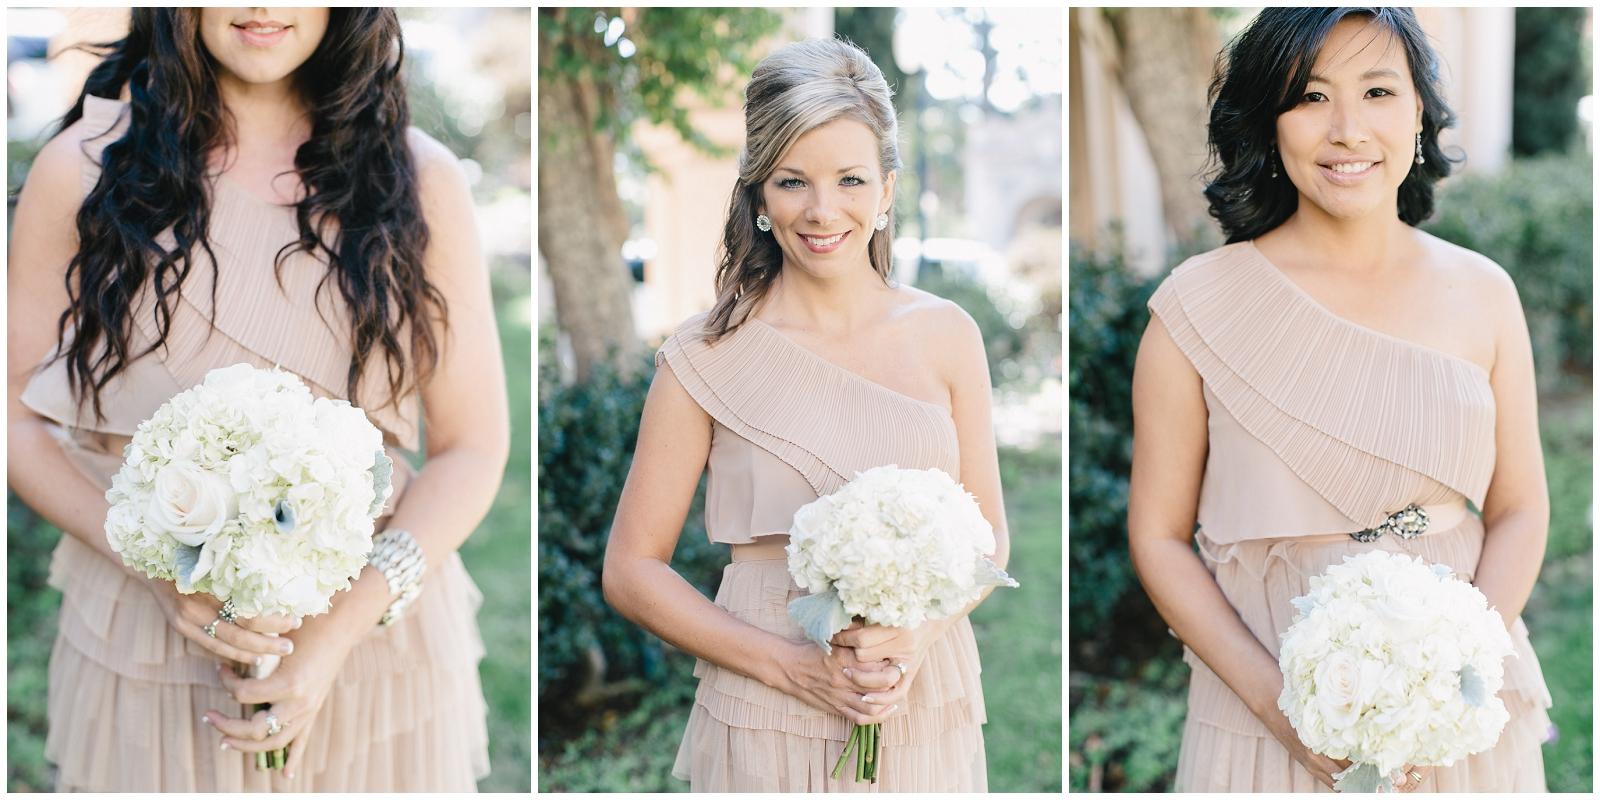 San-Francisco-Bay-Area-Wedding-Photography-Destination-12.jpg